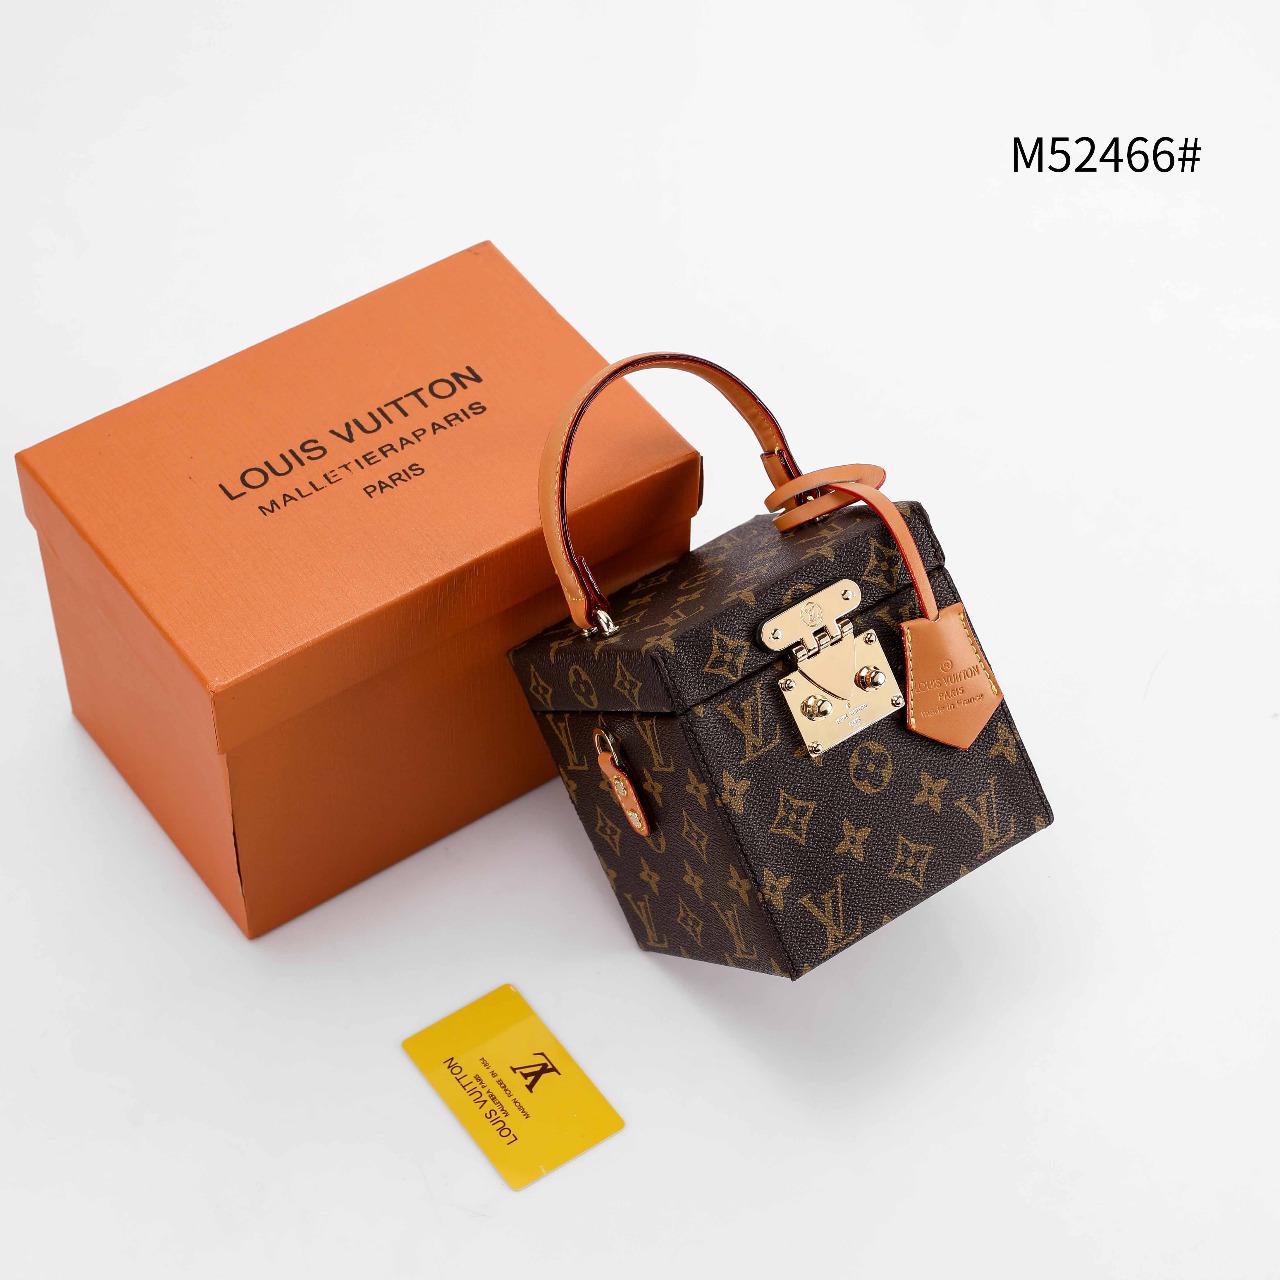 TAS LV SELEMPANG WANITA TERBARU Louis Vuitton M52466H4